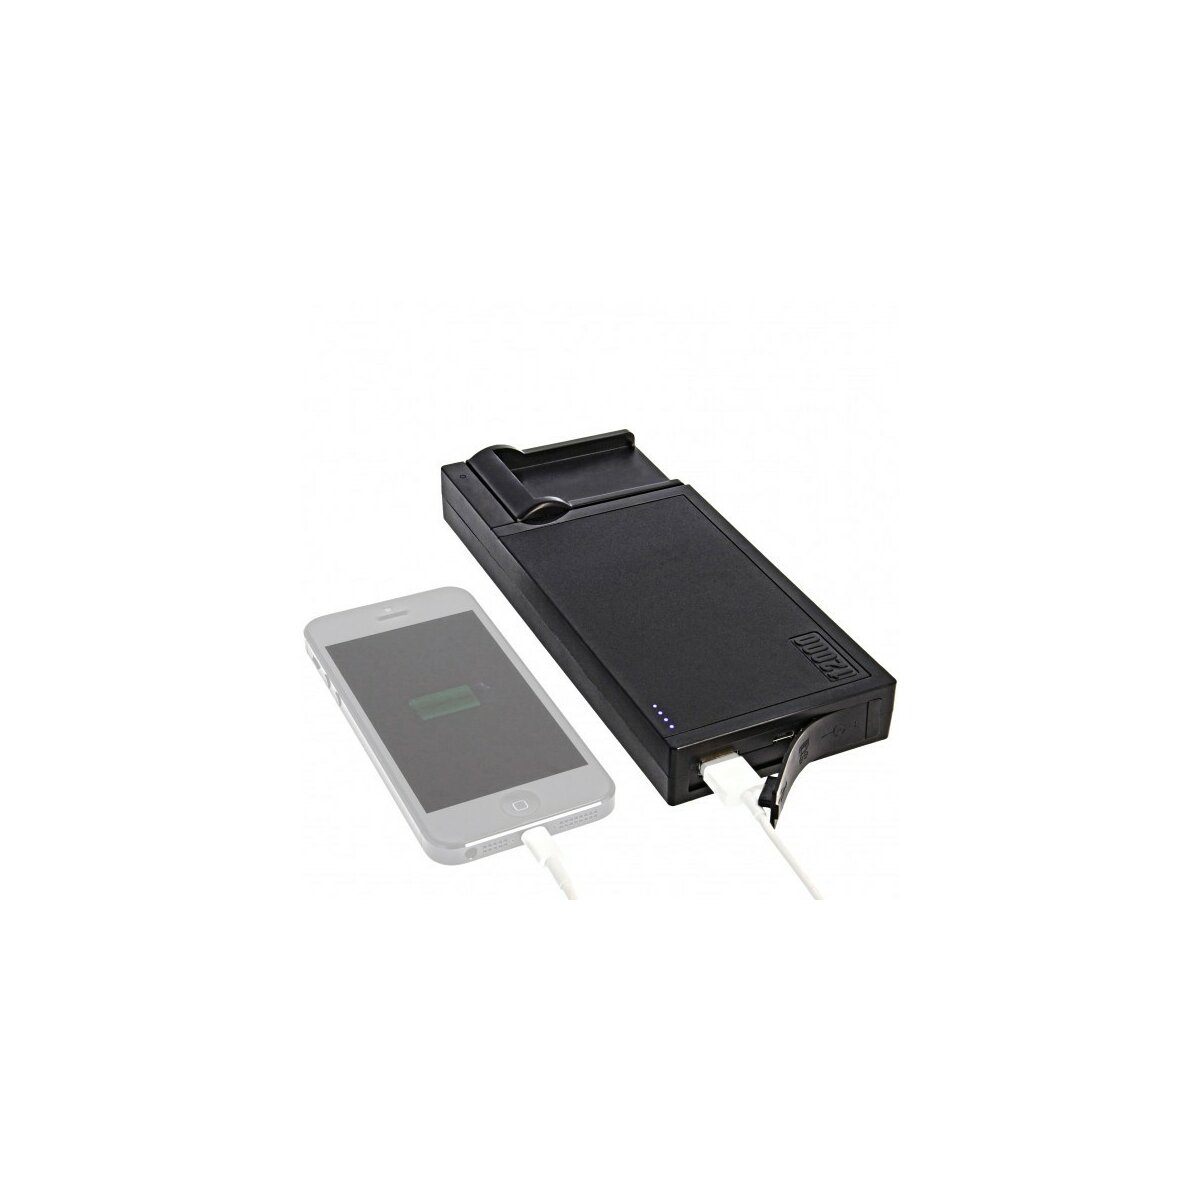 Multi DSLR Ladestation kompatibel mit Canon BP-511/511A/512/522/535 und USB - 12 000 mAh PowerBank Pack kompatibel mit Handy, Akku, Smartphones, Tablets, PSP, Google Glass, GoPro, GPS etc.